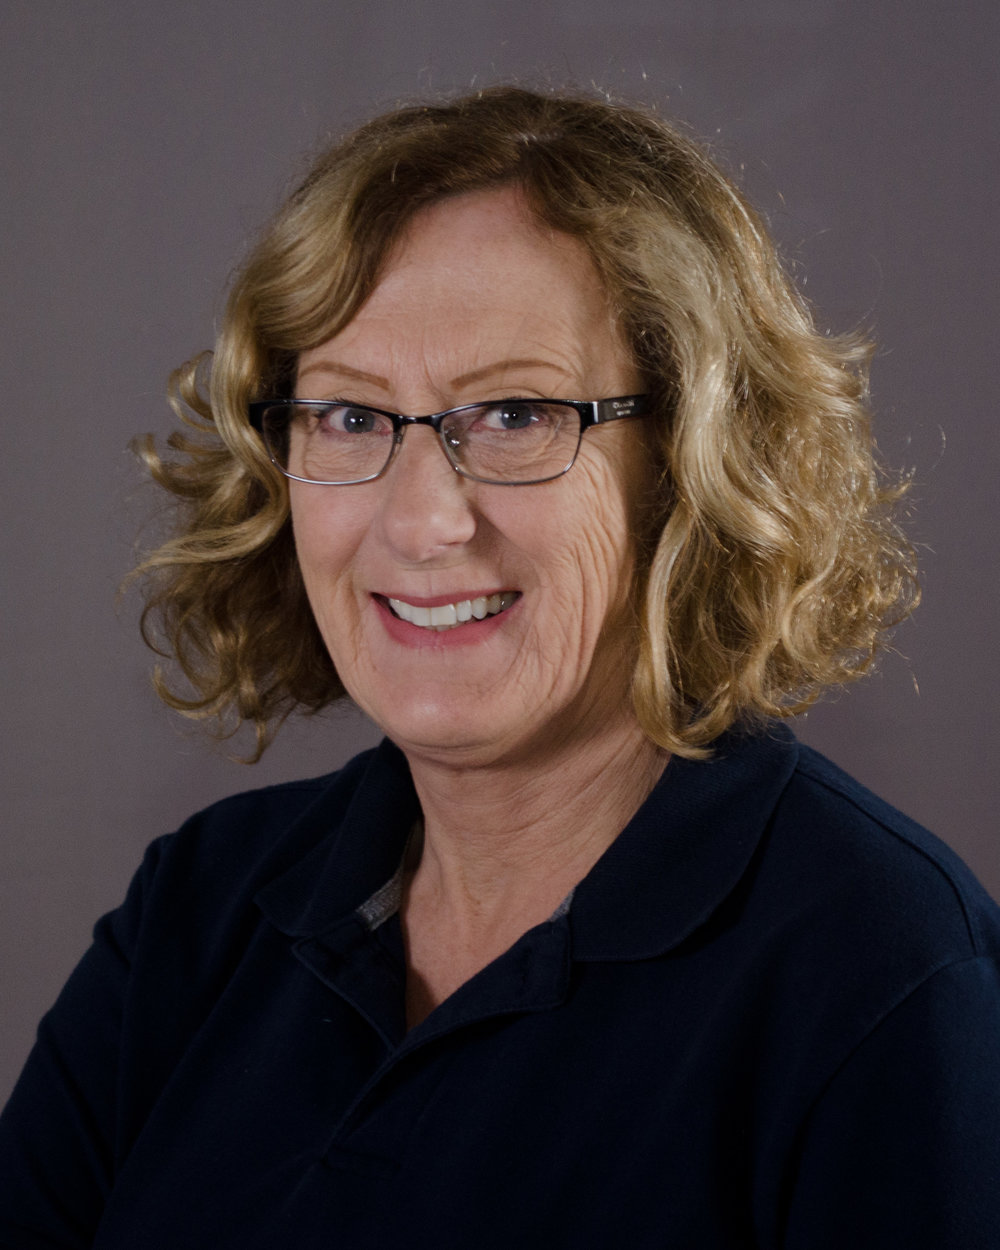 Pam Druhl, Custodian